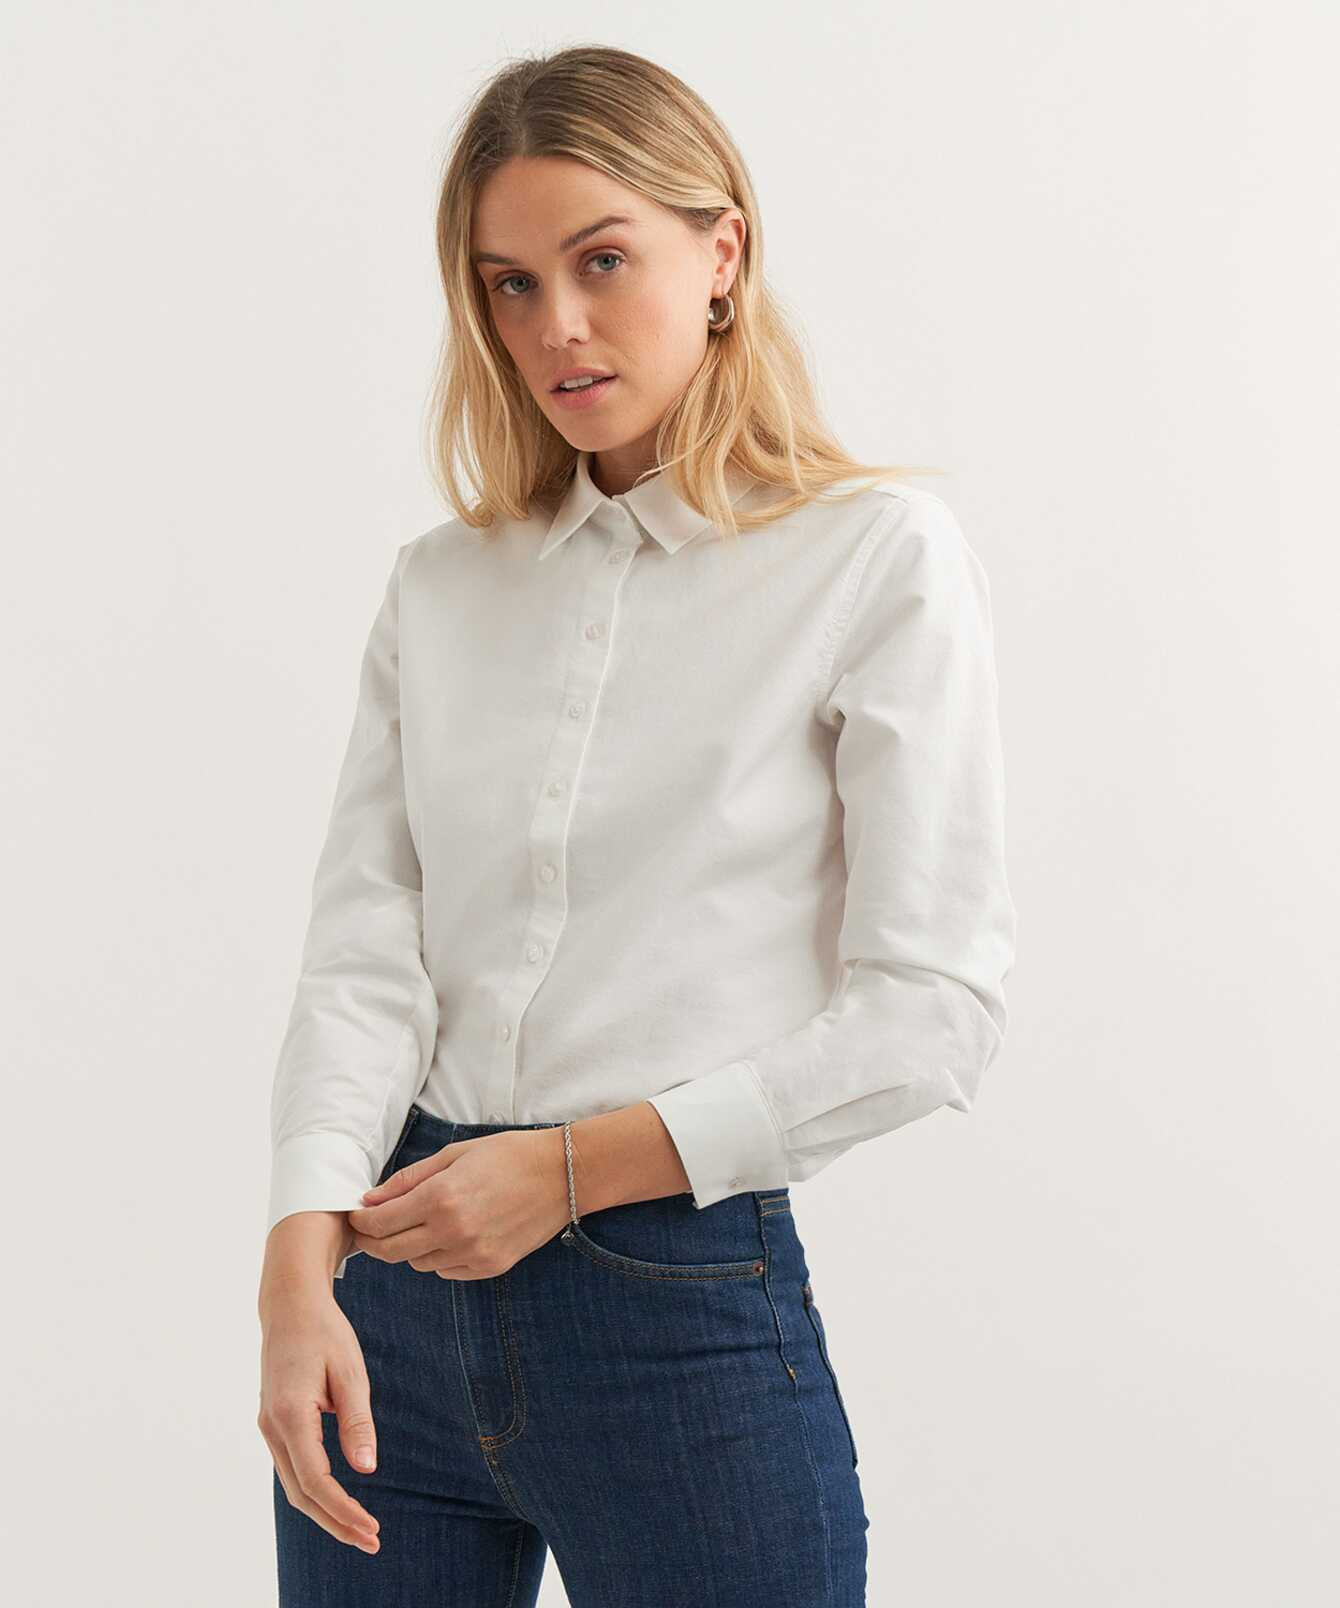 Skjorta Tilde Boston Oxford Vit The Shirt Factory